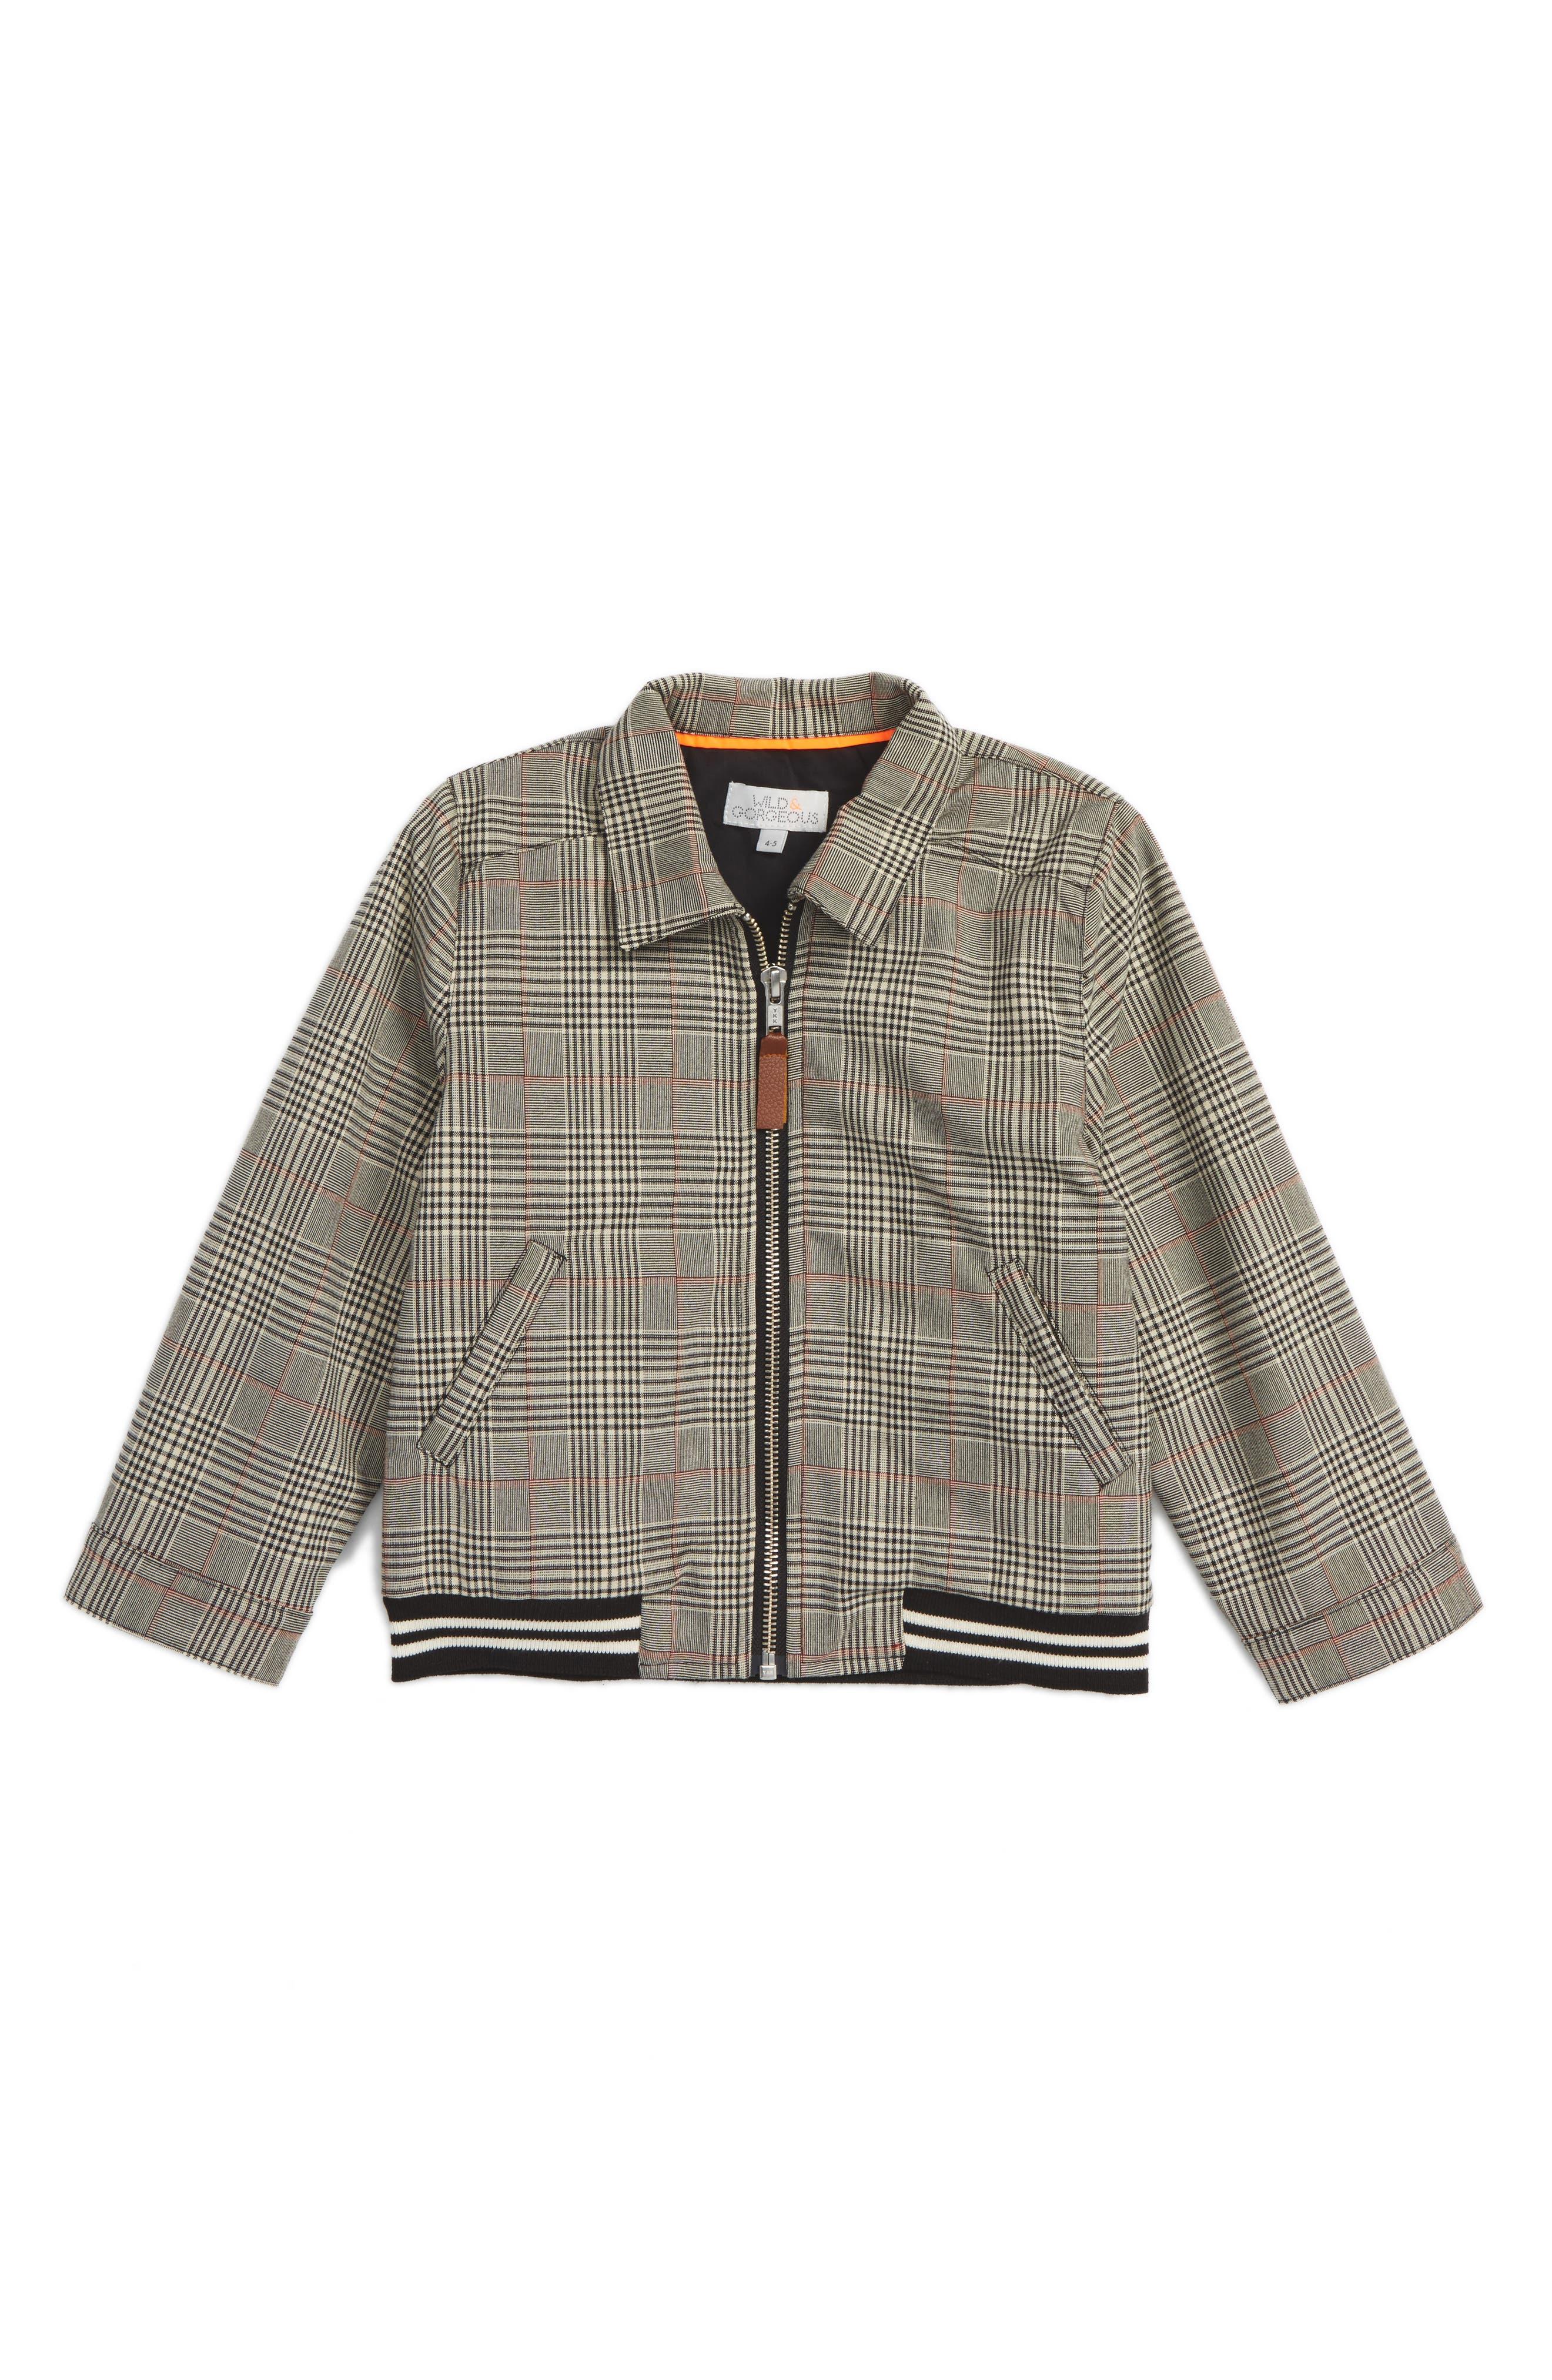 Donald Jacket,                         Main,                         color, Black